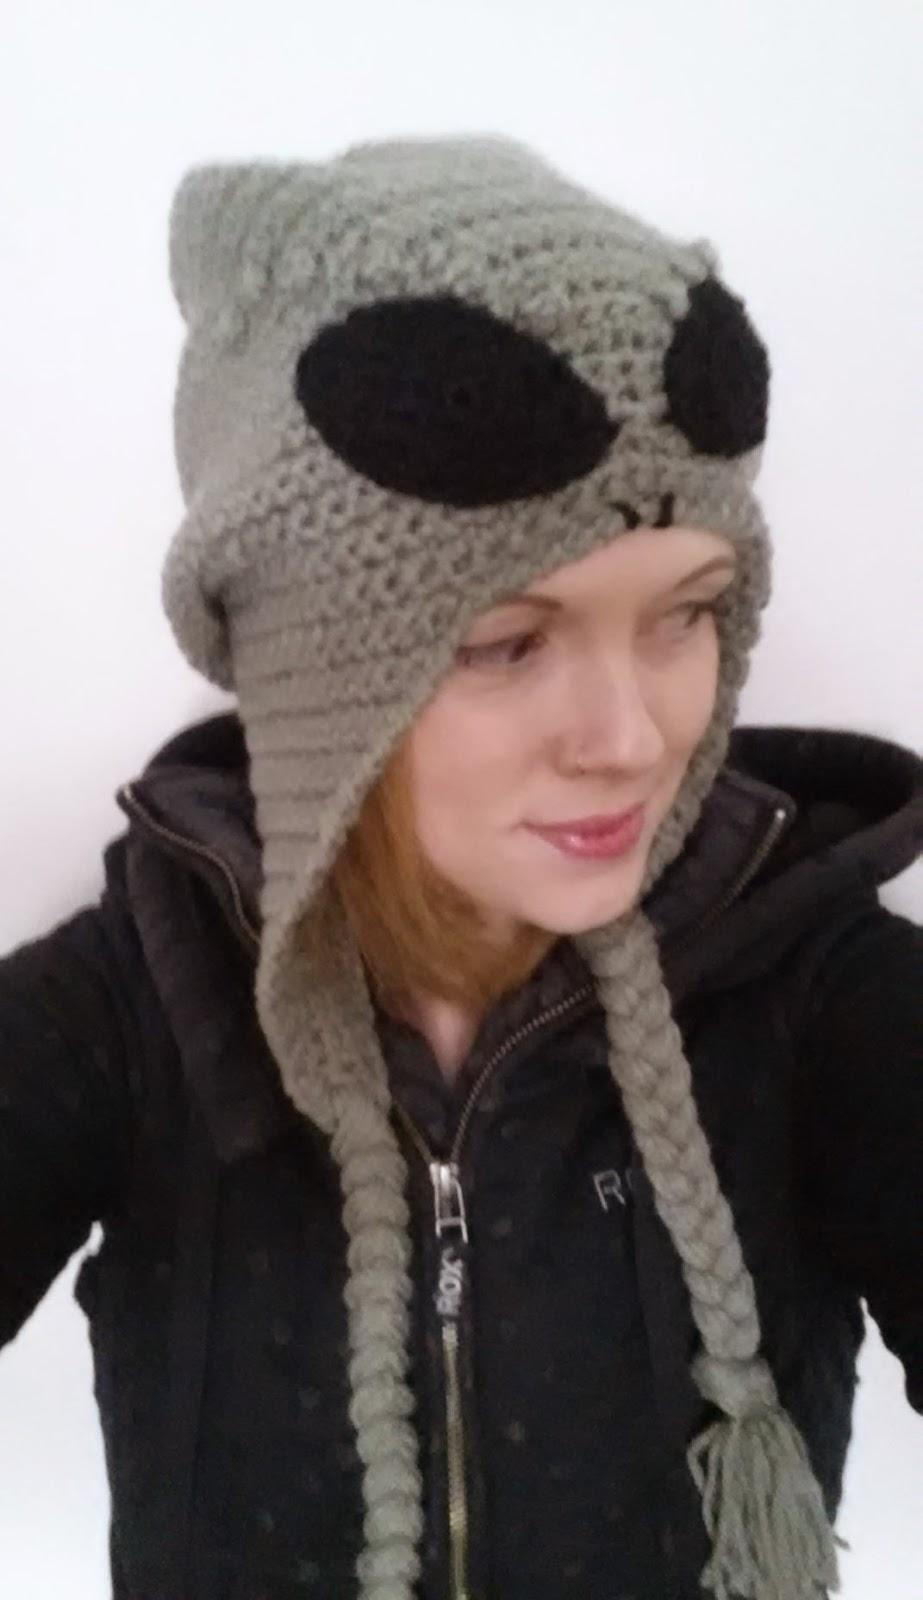 Quot The Greys Quot Alien Slouchy Earflap Hat Free Crochet Pattern